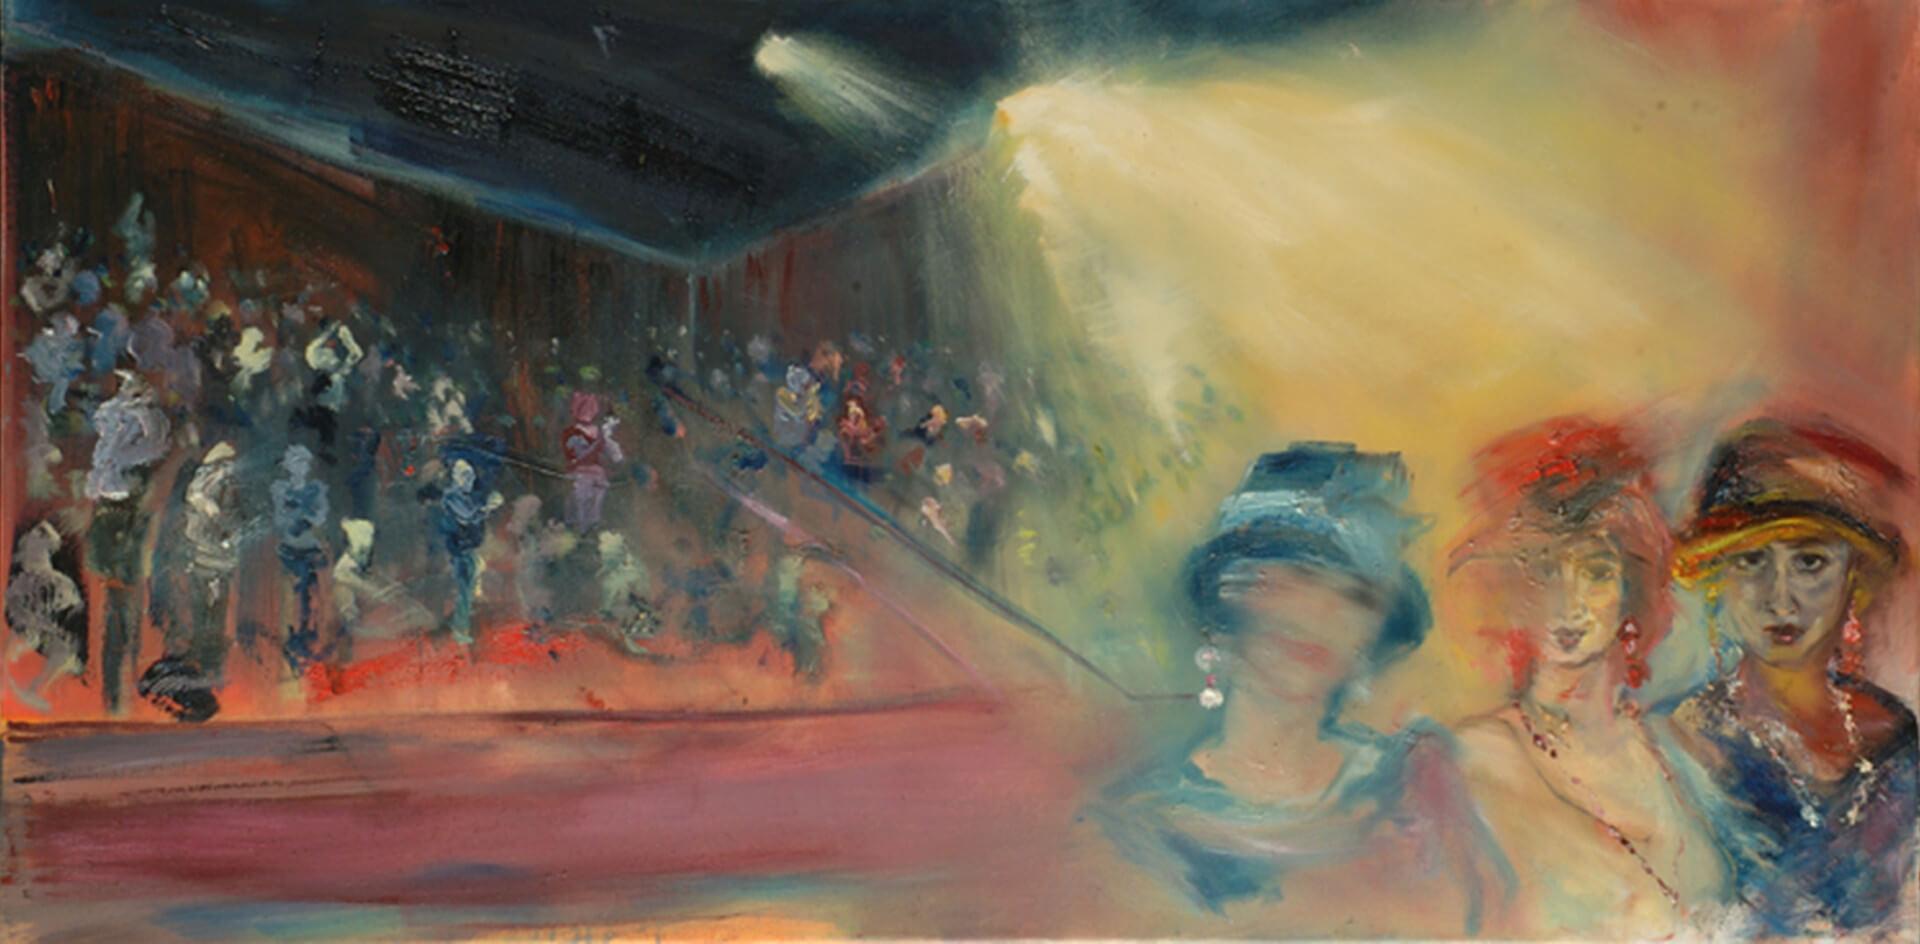 2004 - Oil on canvas. 80 cm. x 100 cm.